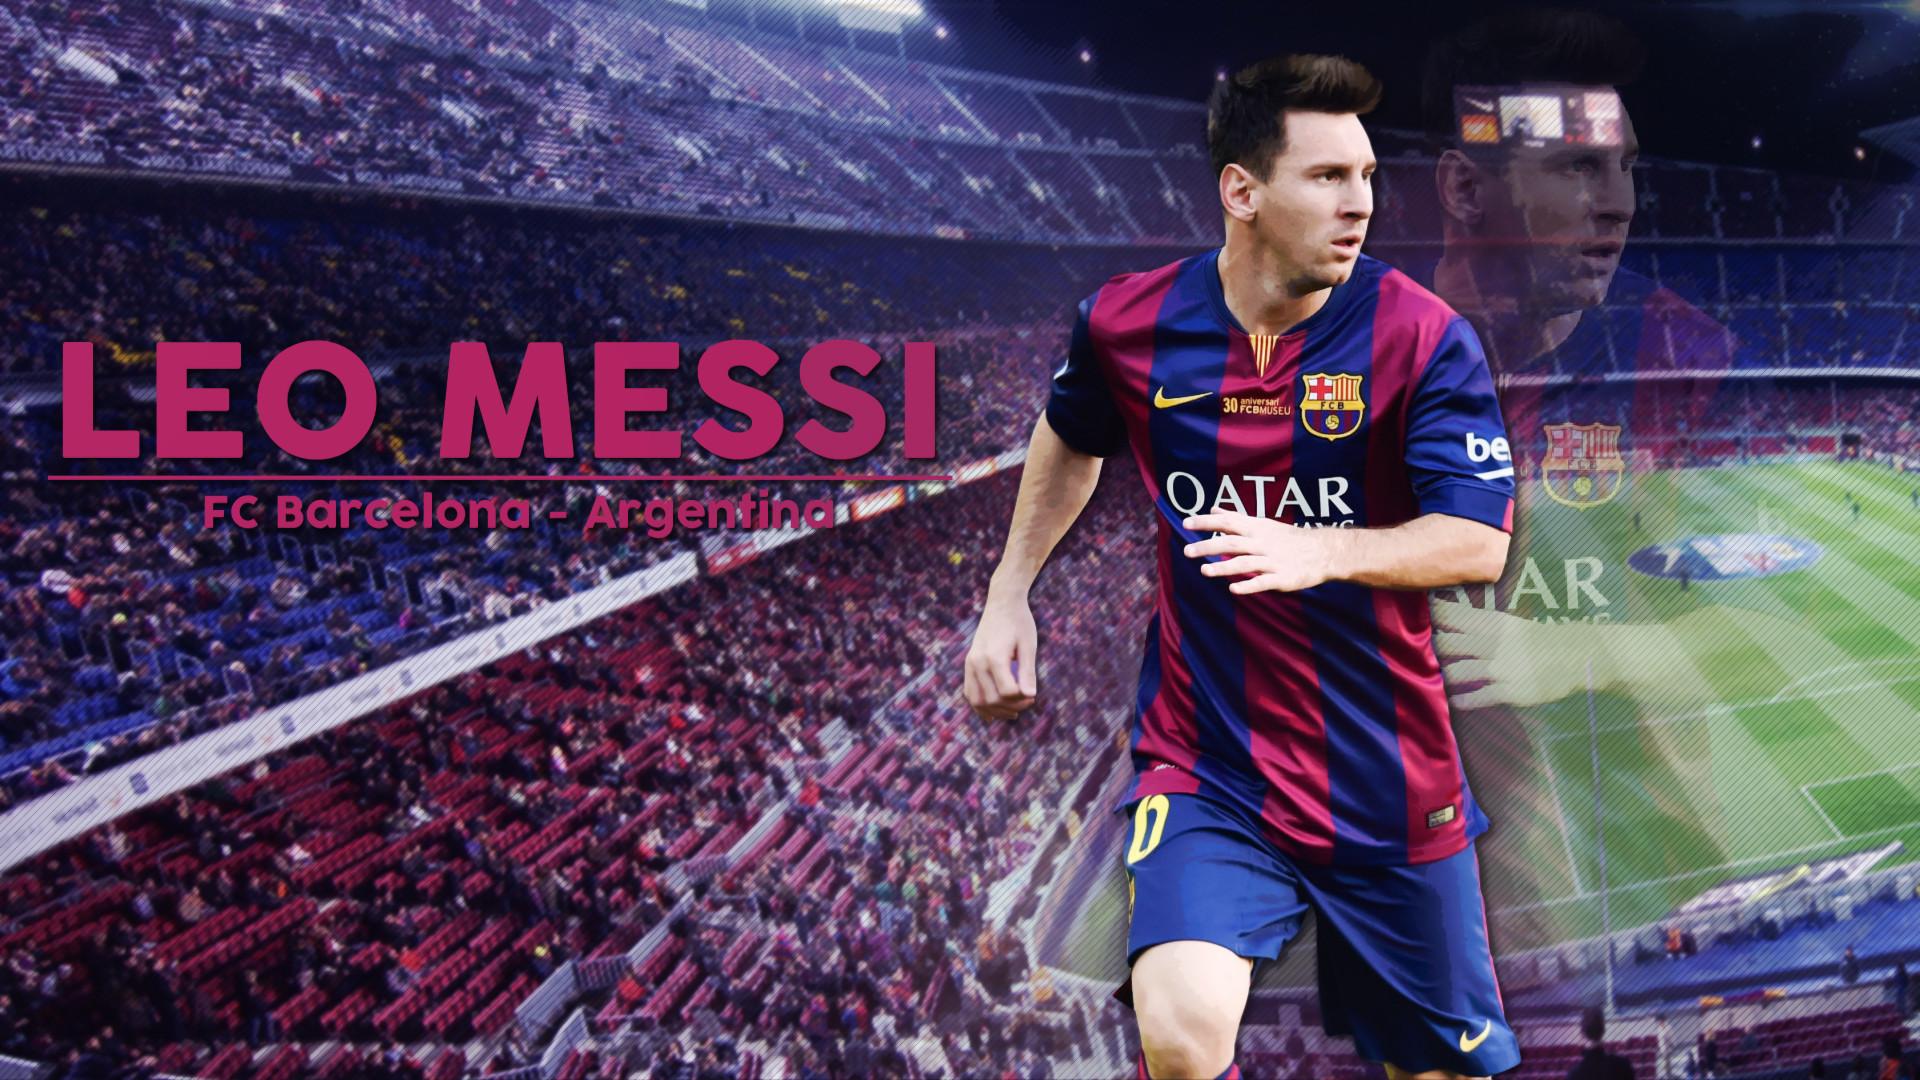 Lionel Messi Full HD Wallpaper 1920×1080